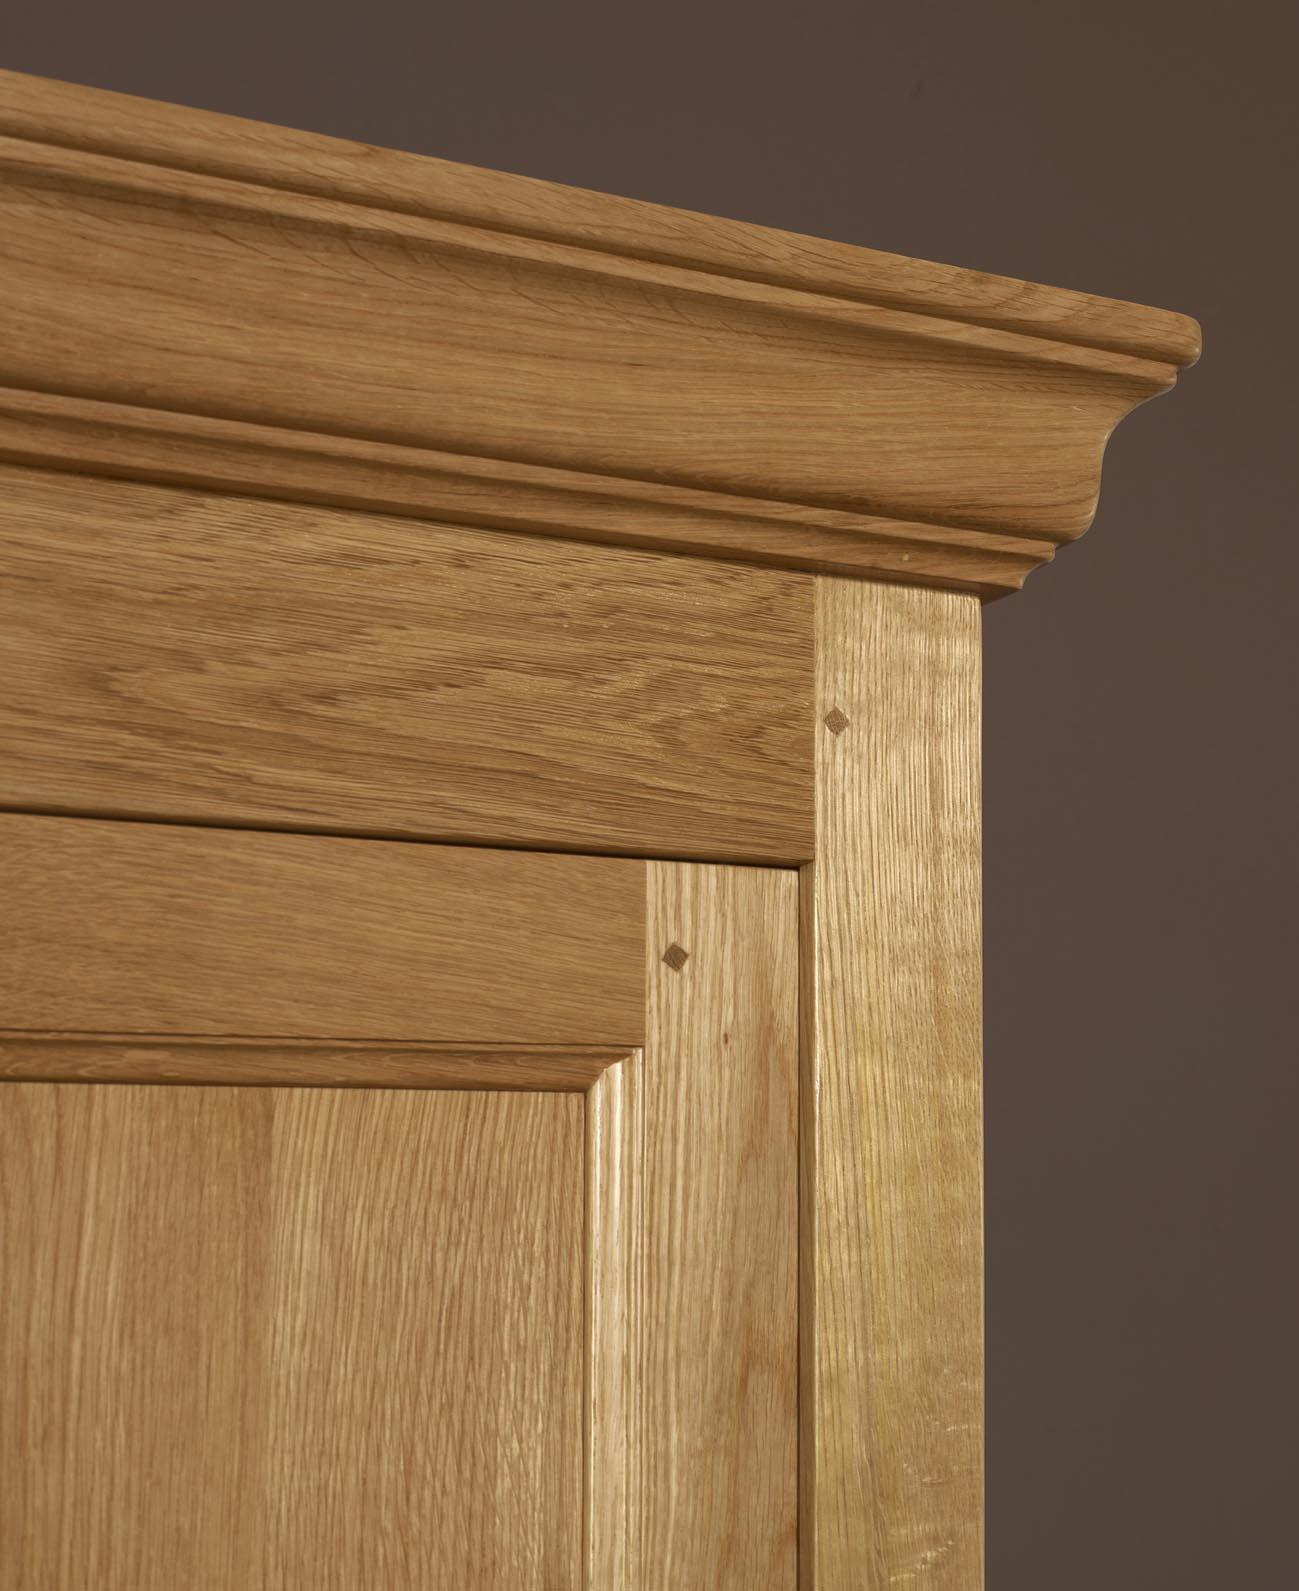 Armoire 2 portes en ch ne massif de style campagnard - Armoire ancienne 2 portes ...